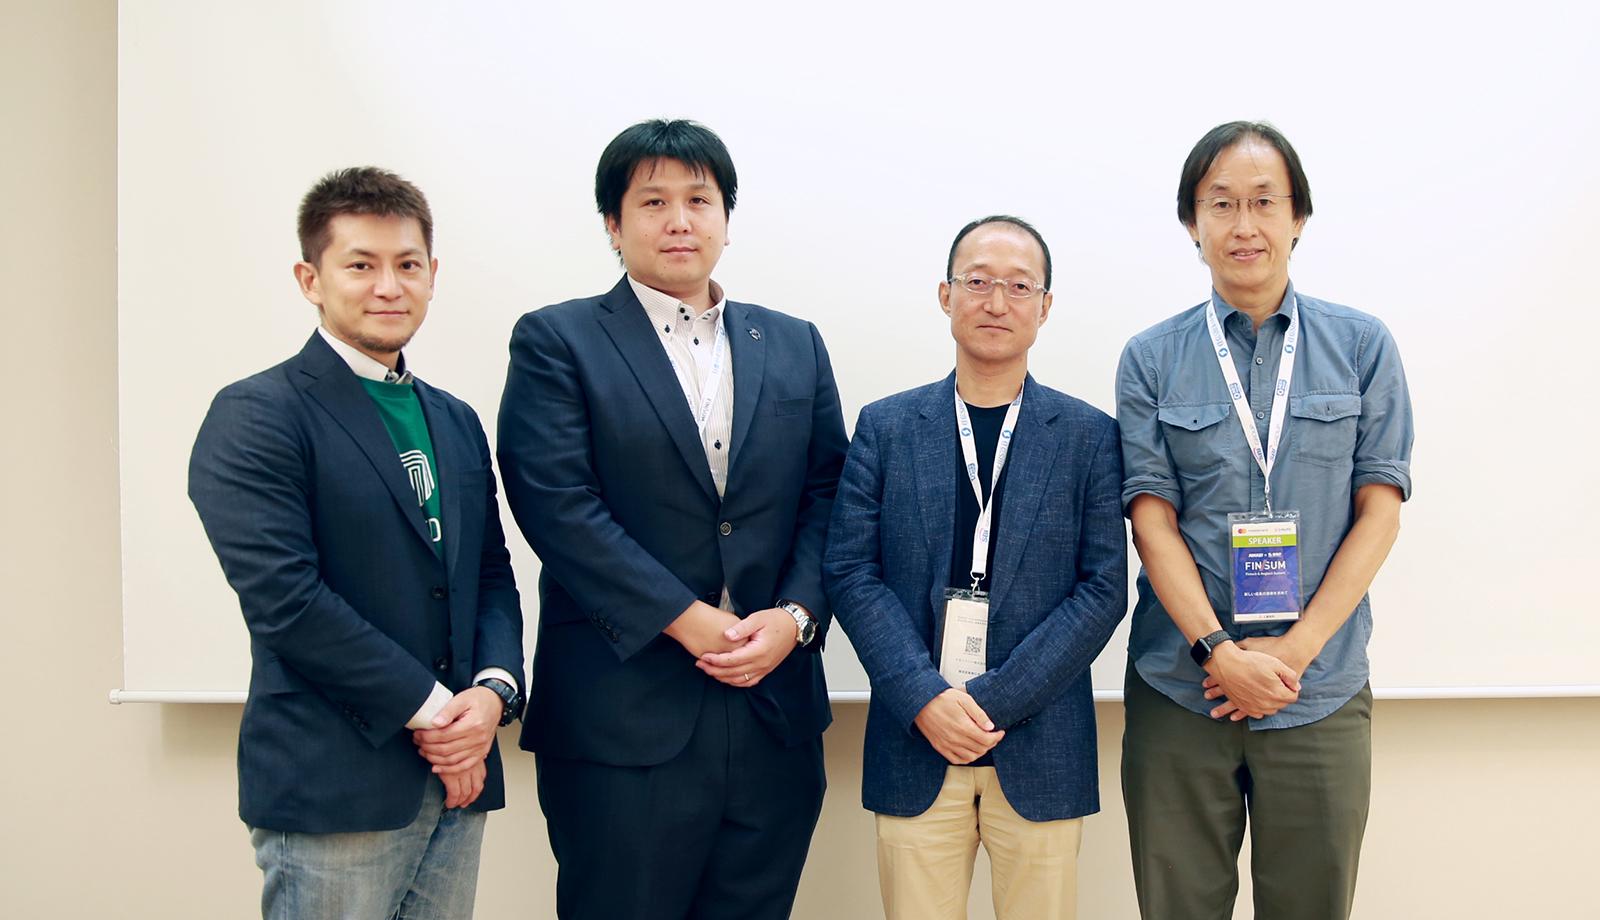 Moneytree's Taizo Miyagami with TRUSTDOCK CEO, Chiba and TRUSTe's  Director / Secretary General Saito with the moderator, technology writer, Ootani